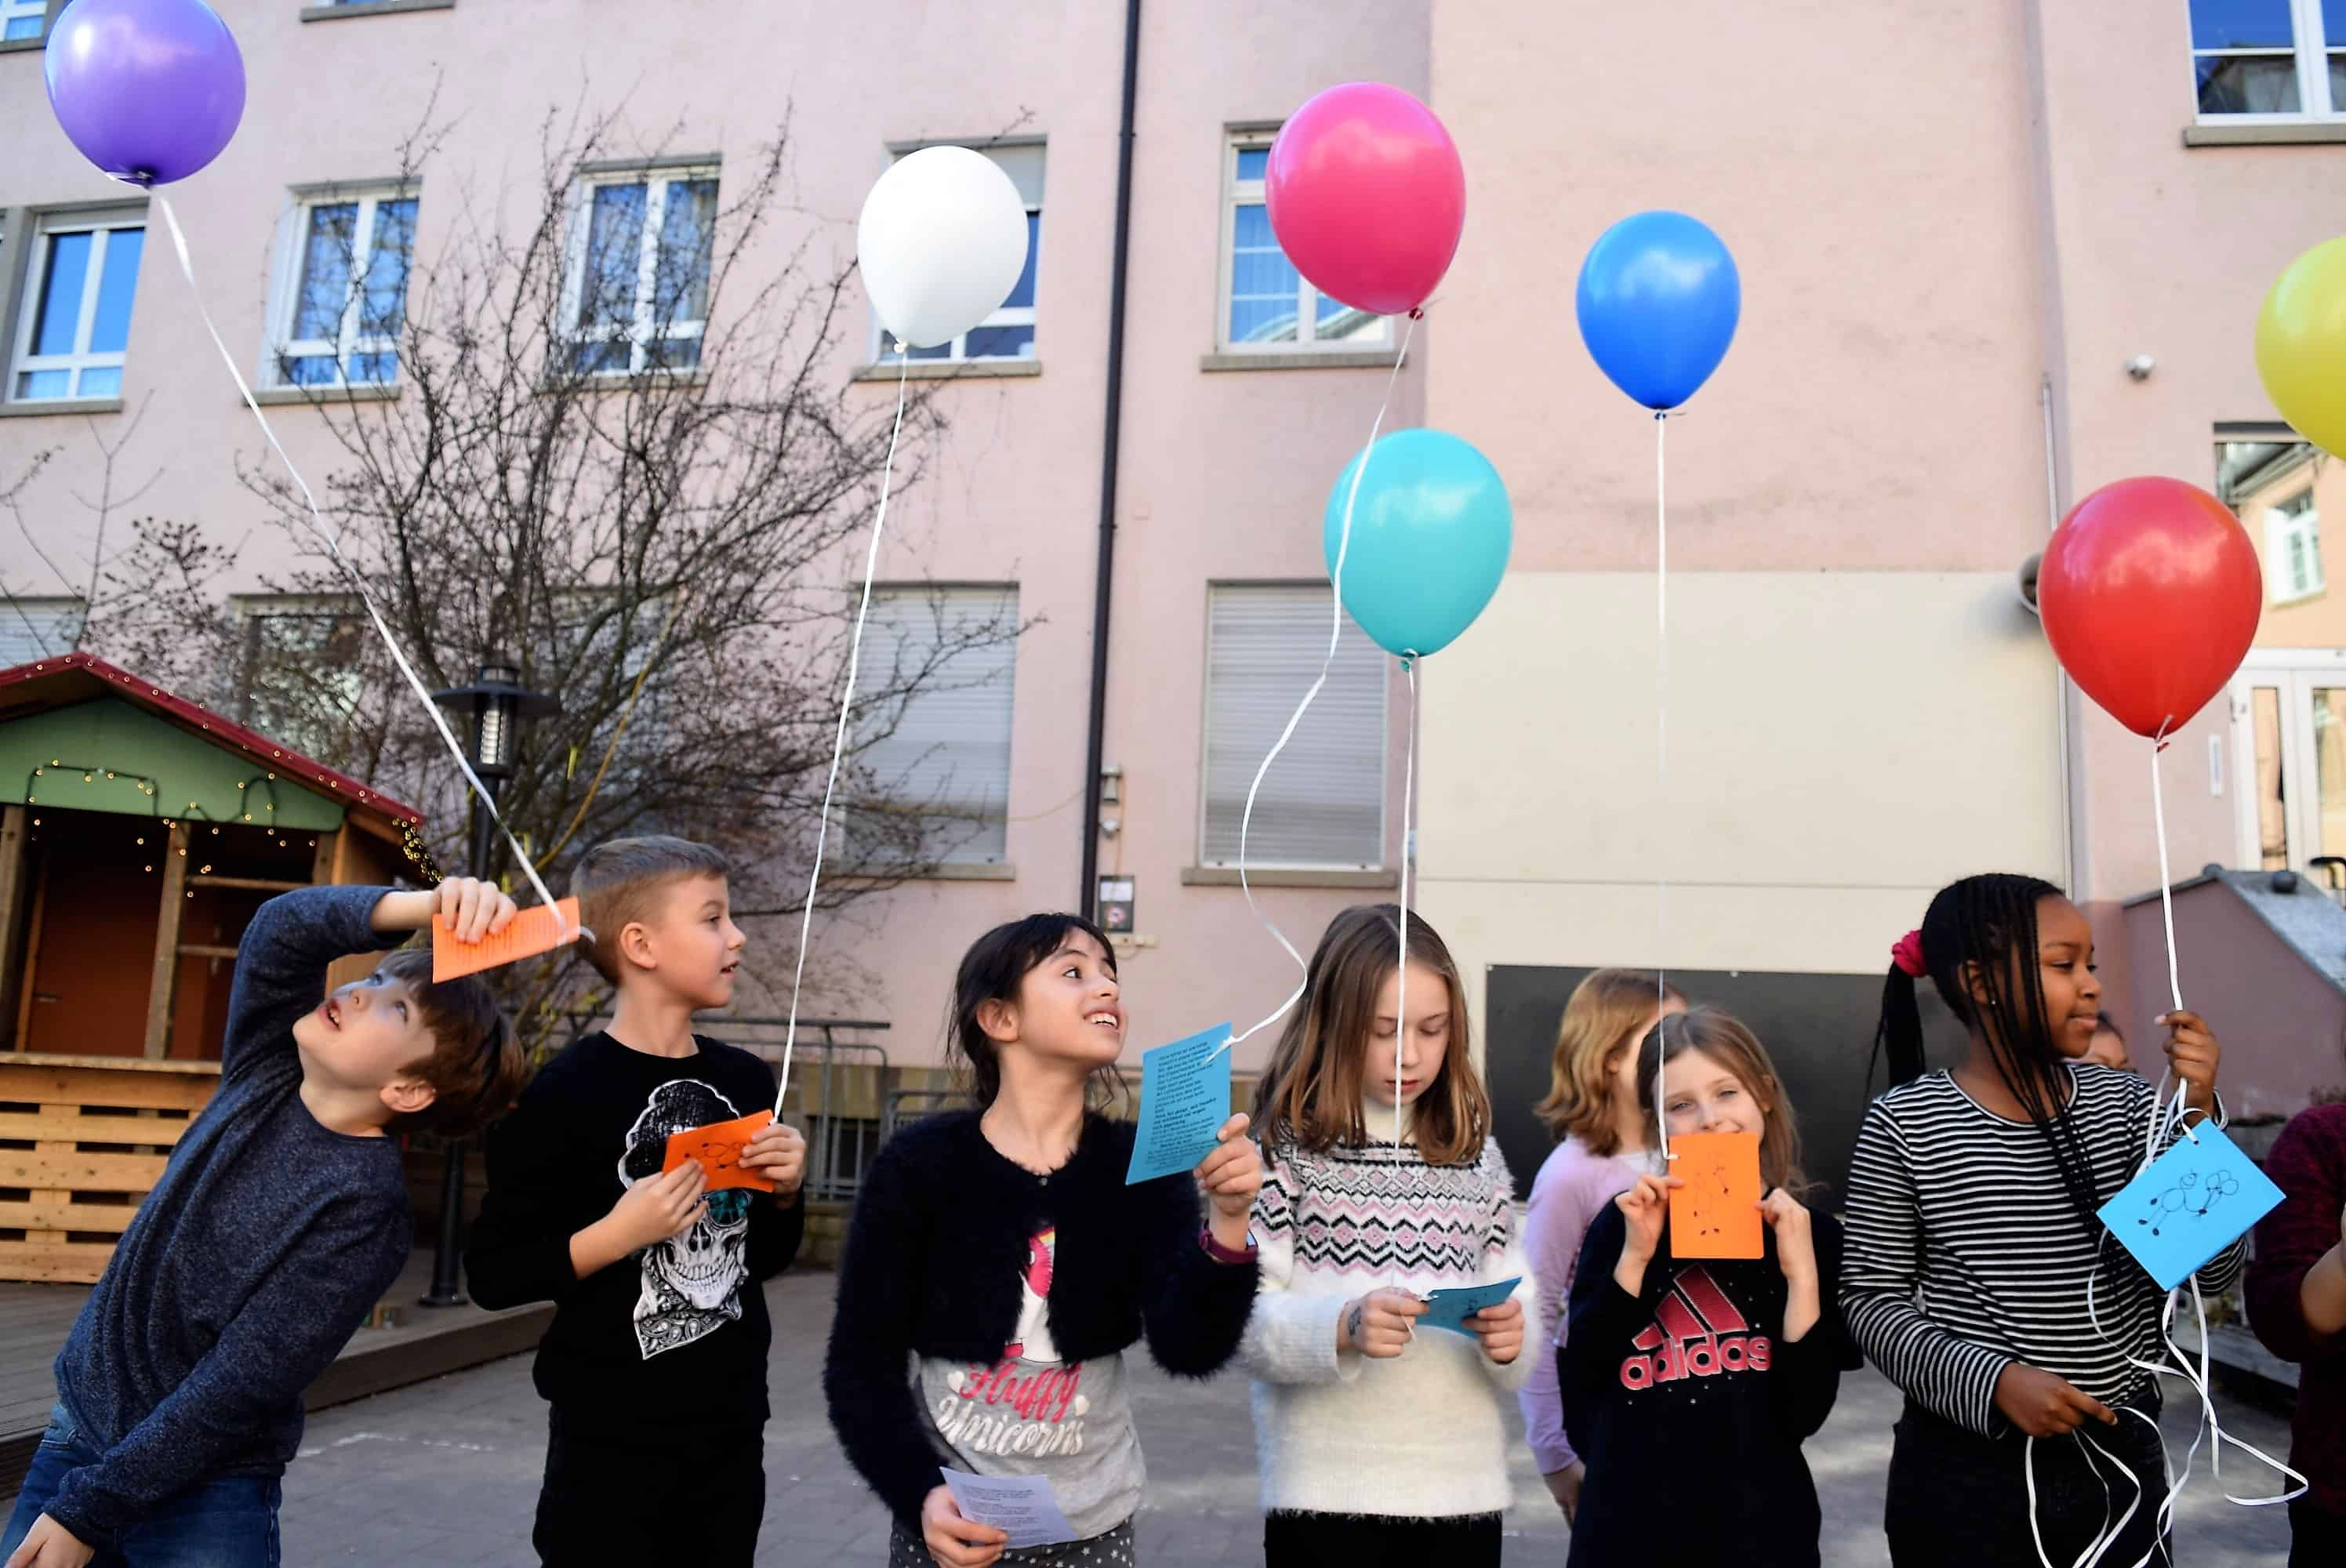 Kinder halten Luftballons